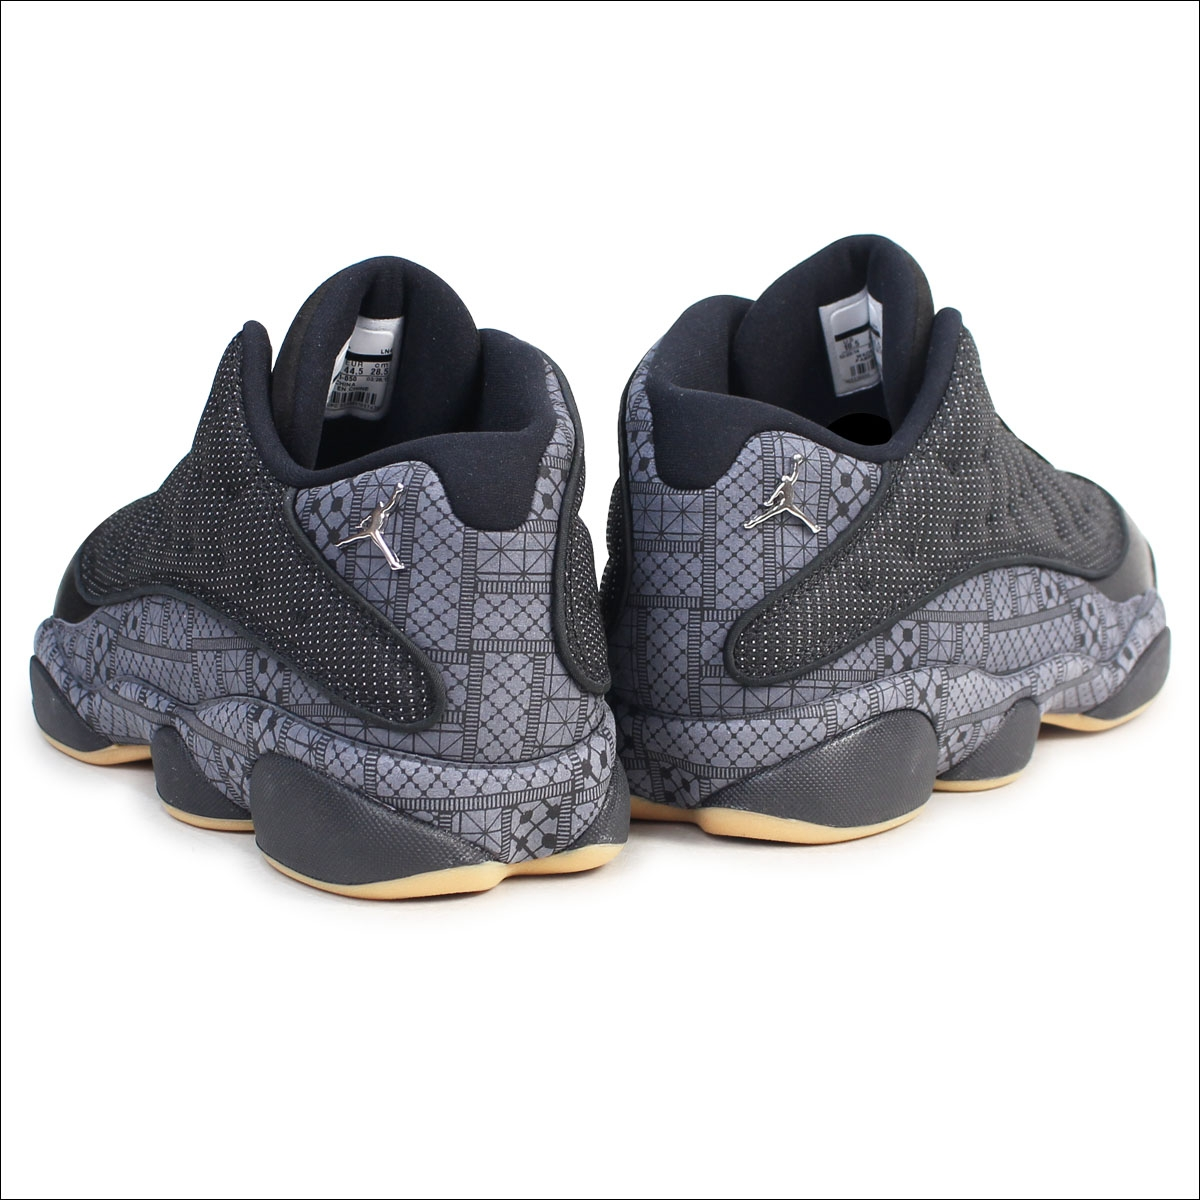 786be8436c61f5 NIKE Nike Air Jordan 13 nostalgic sneakers AIR JORDAN 13 RETRO LOW QUAI 54  810